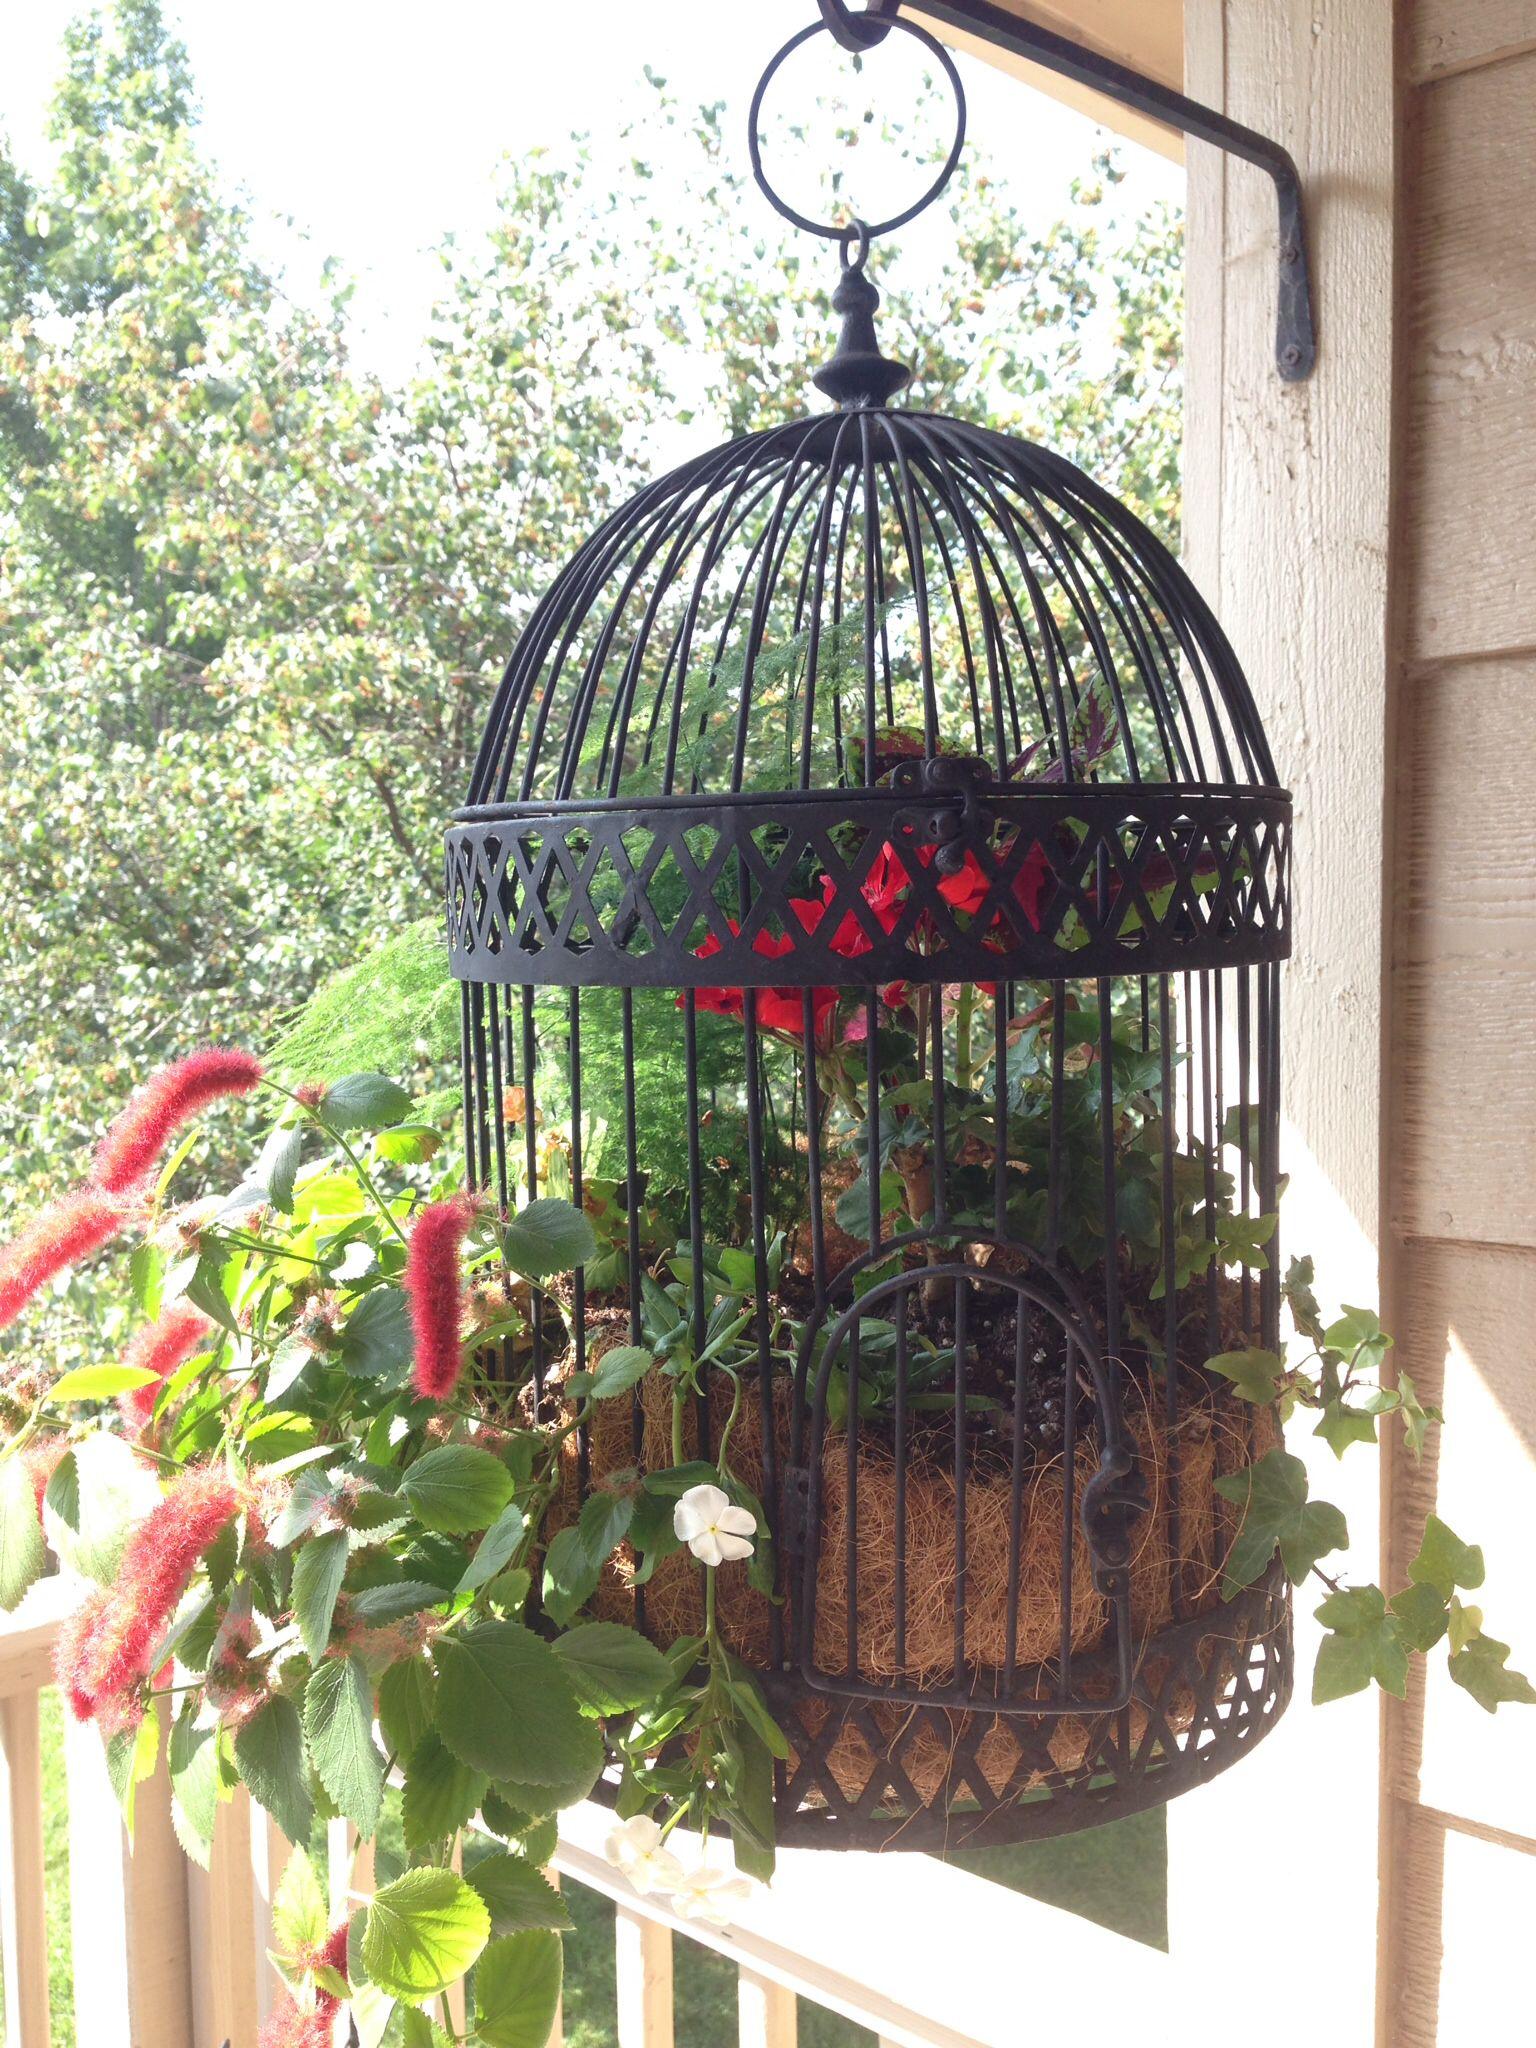 bird cage planter summer in the usa birdcage planter terranium ideas front porch landscape. Black Bedroom Furniture Sets. Home Design Ideas